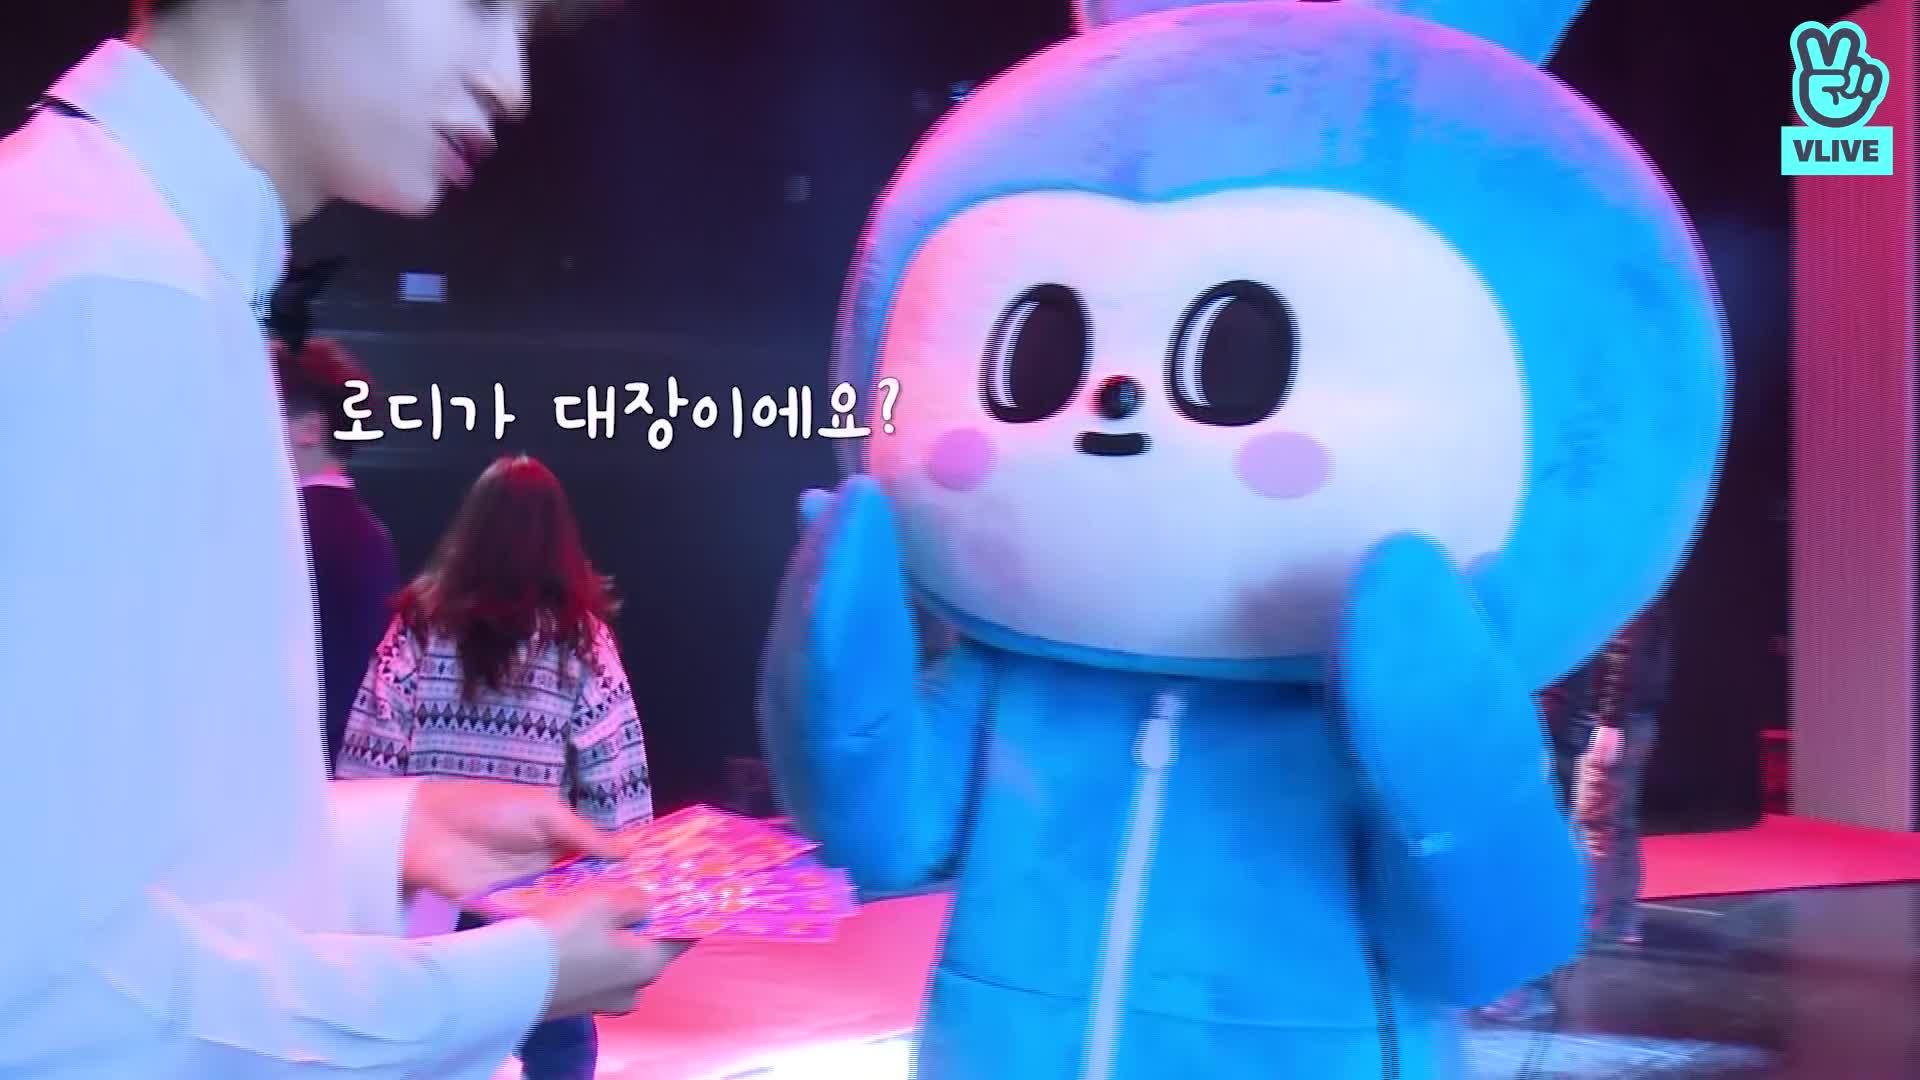 [V CREW] 붐보의 브이로그 - EP. 07 아기태양 이진혁 바닐라 스테이지에 가다🌞 (왕대럼쥐🐿의 왕다정한💕 팬서비스 미쳤다 미쳤어..)  